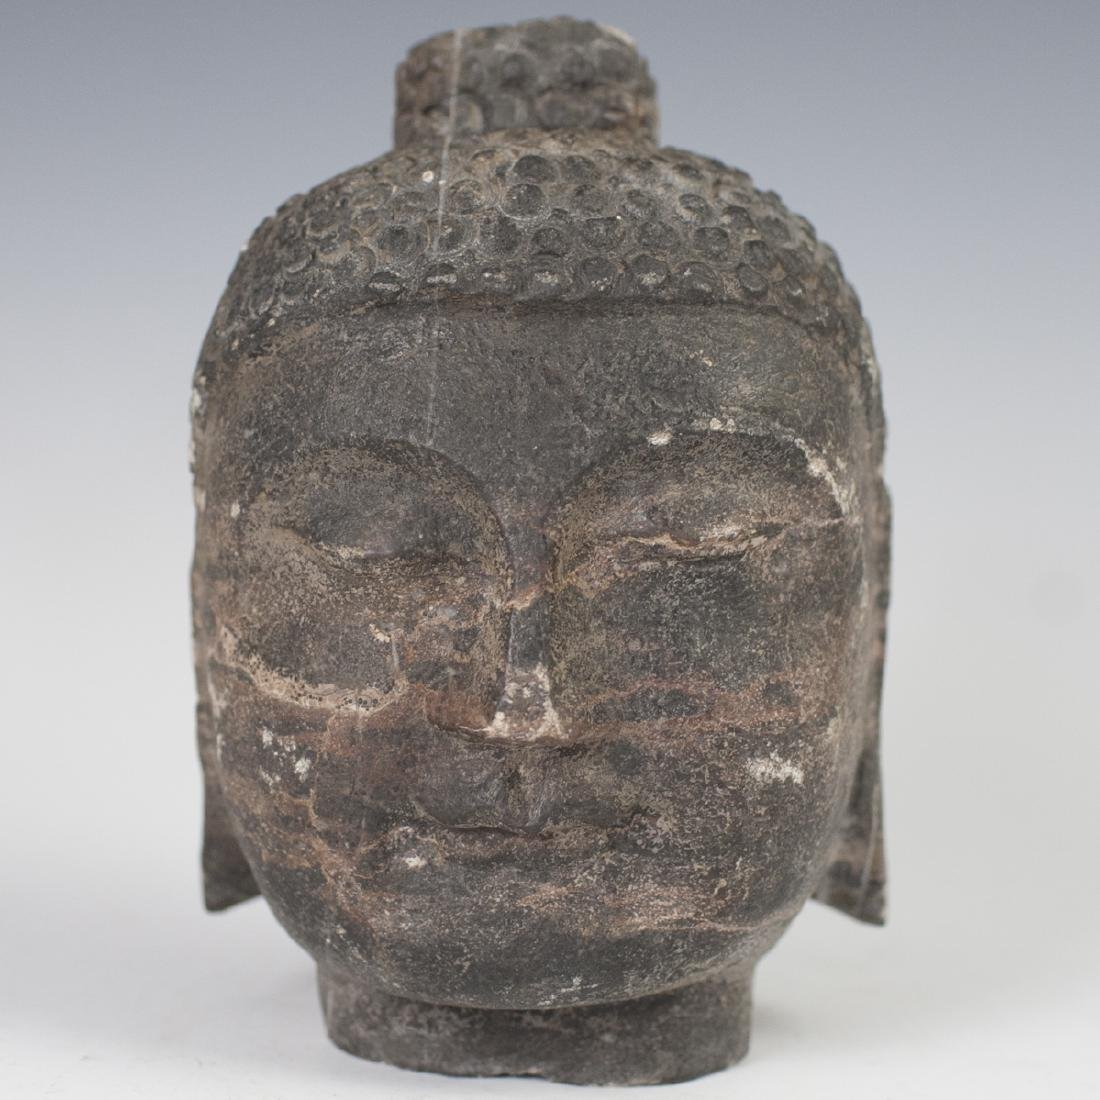 Antique Tibetan Carved Stone Buddha Head